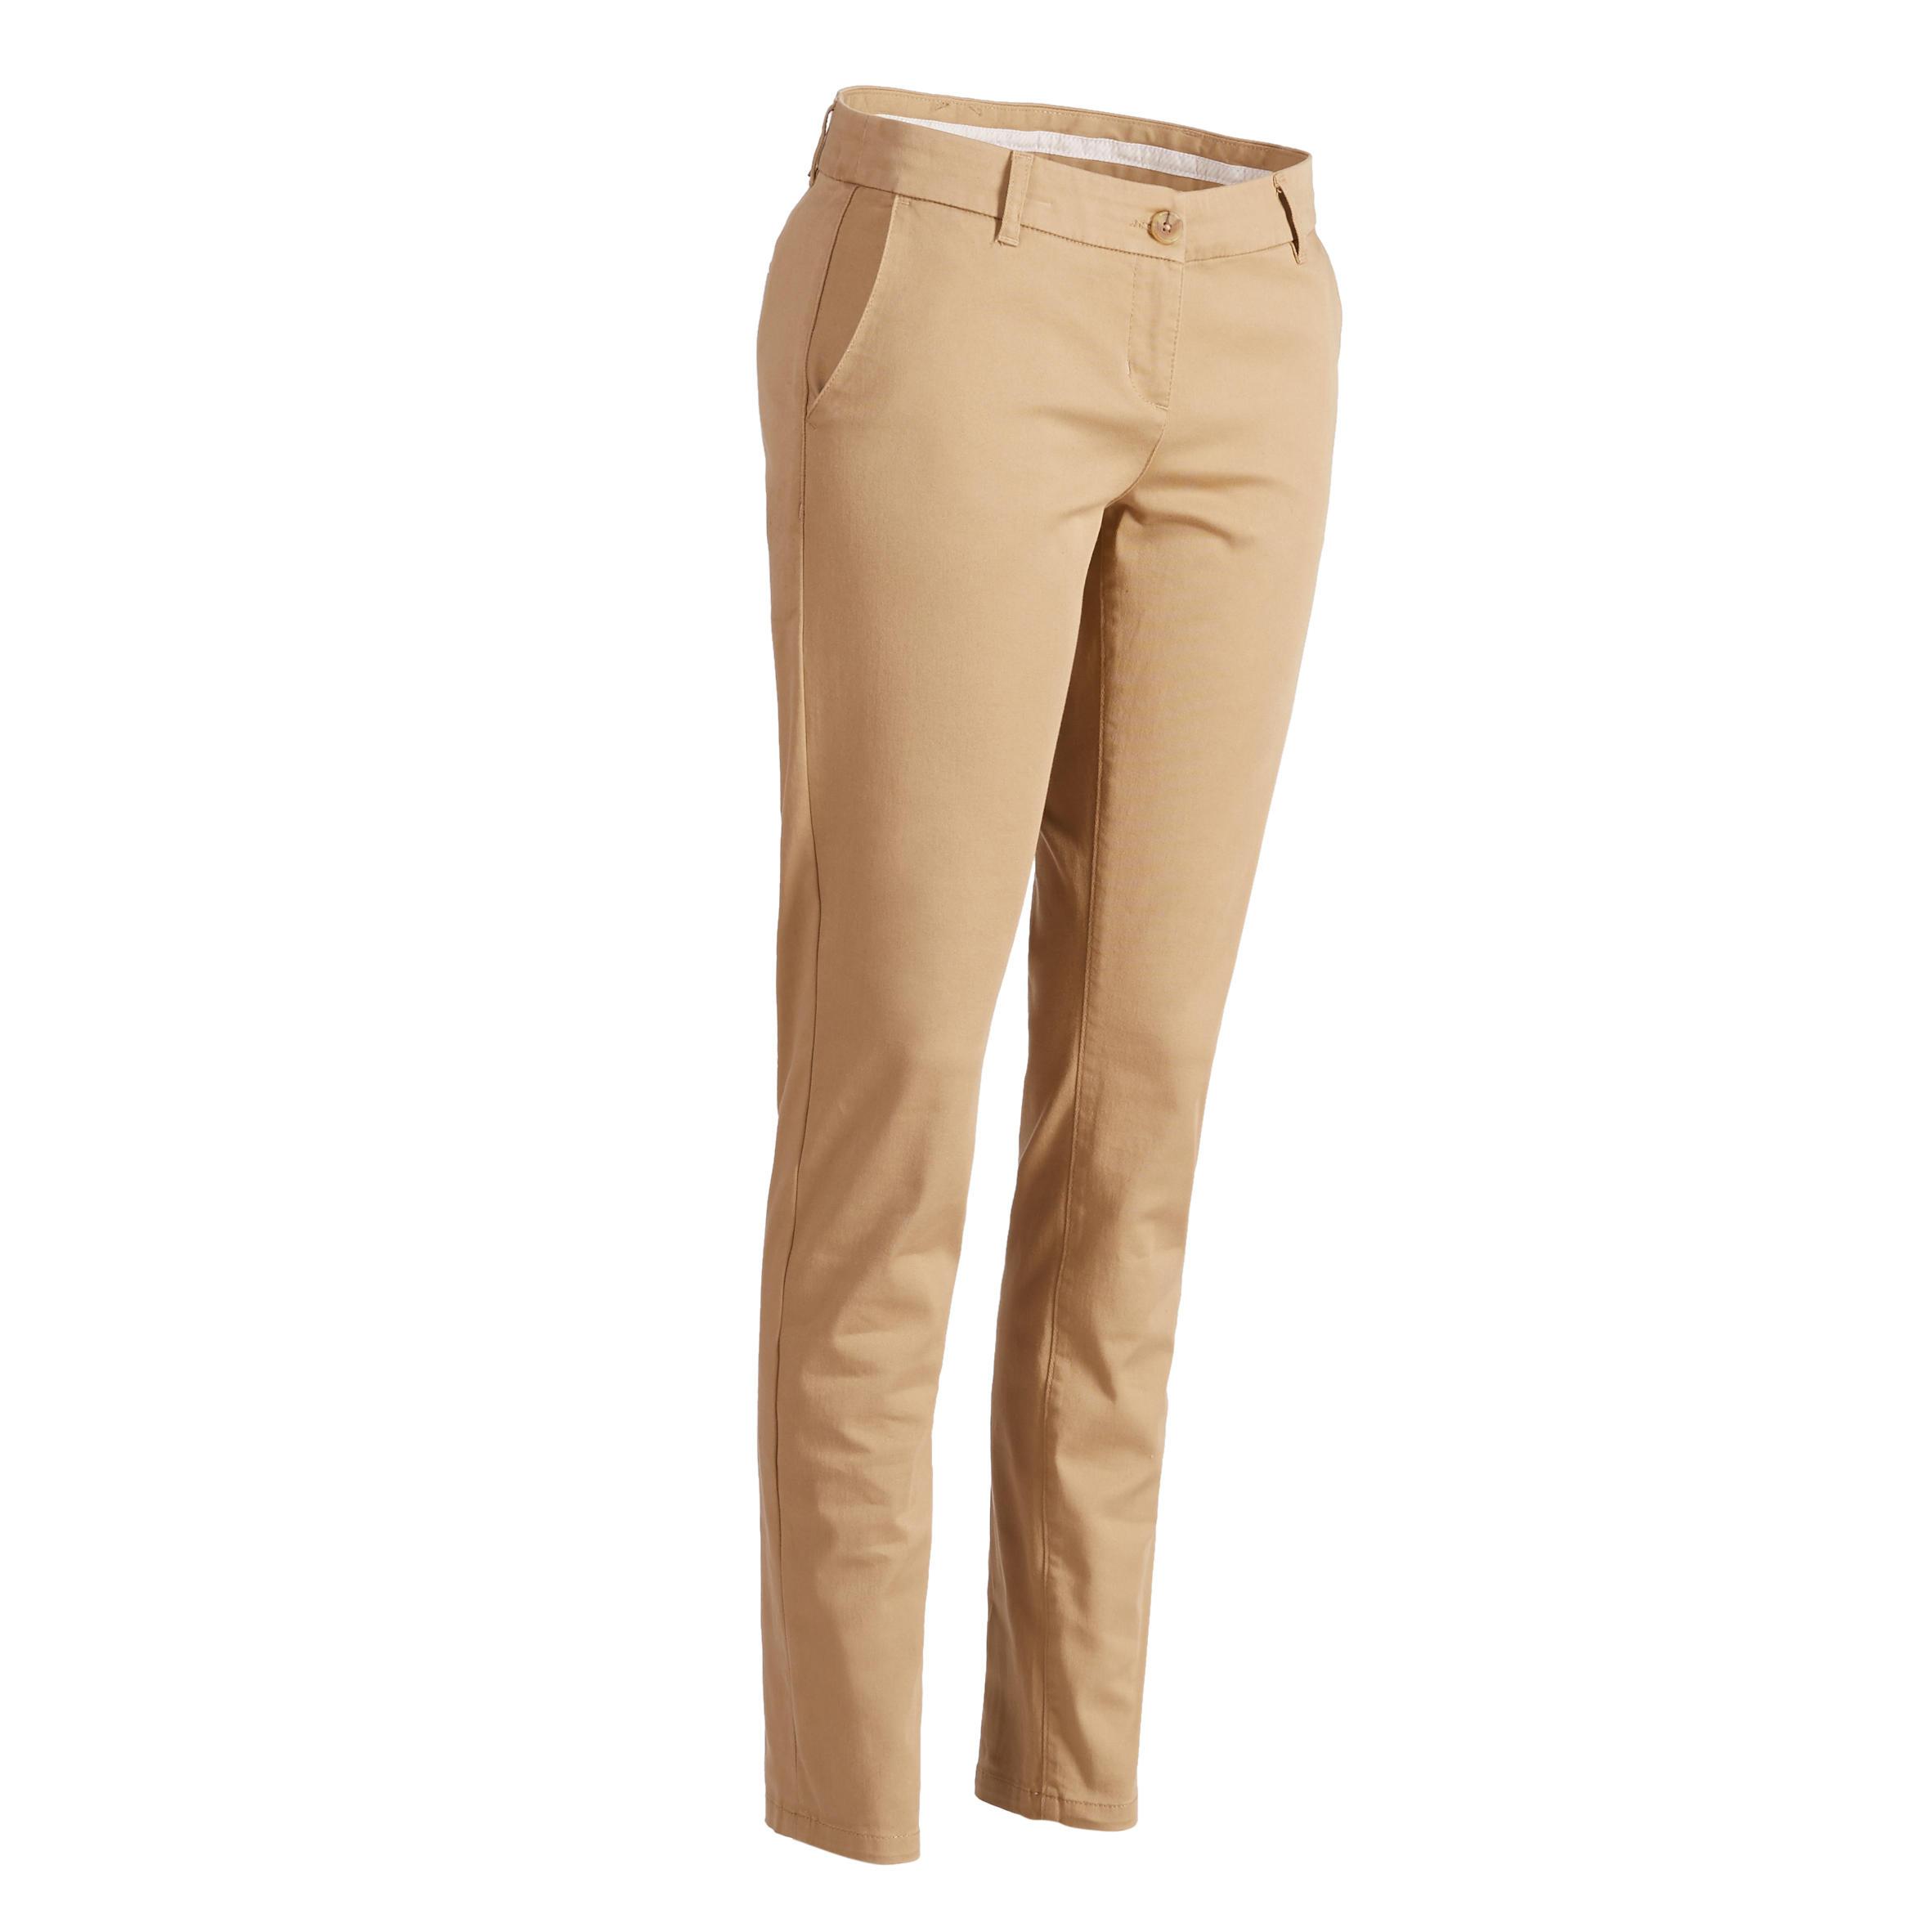 Women's Golf Pants 500 - Beige